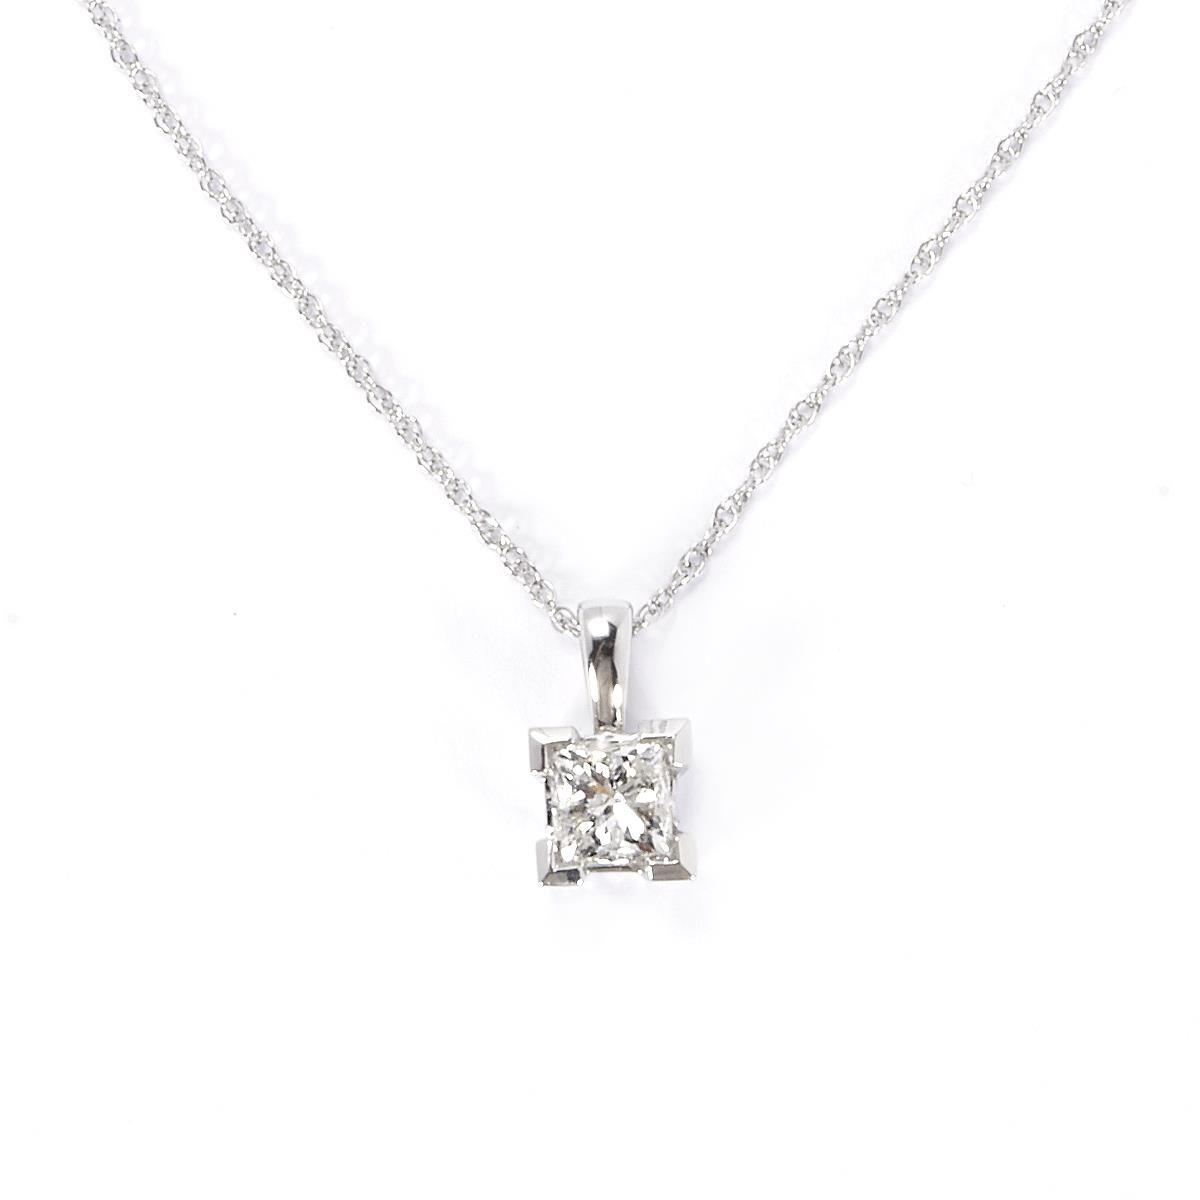 1ct Princess Cut Diamond 18k White Gold Pendant Necklace